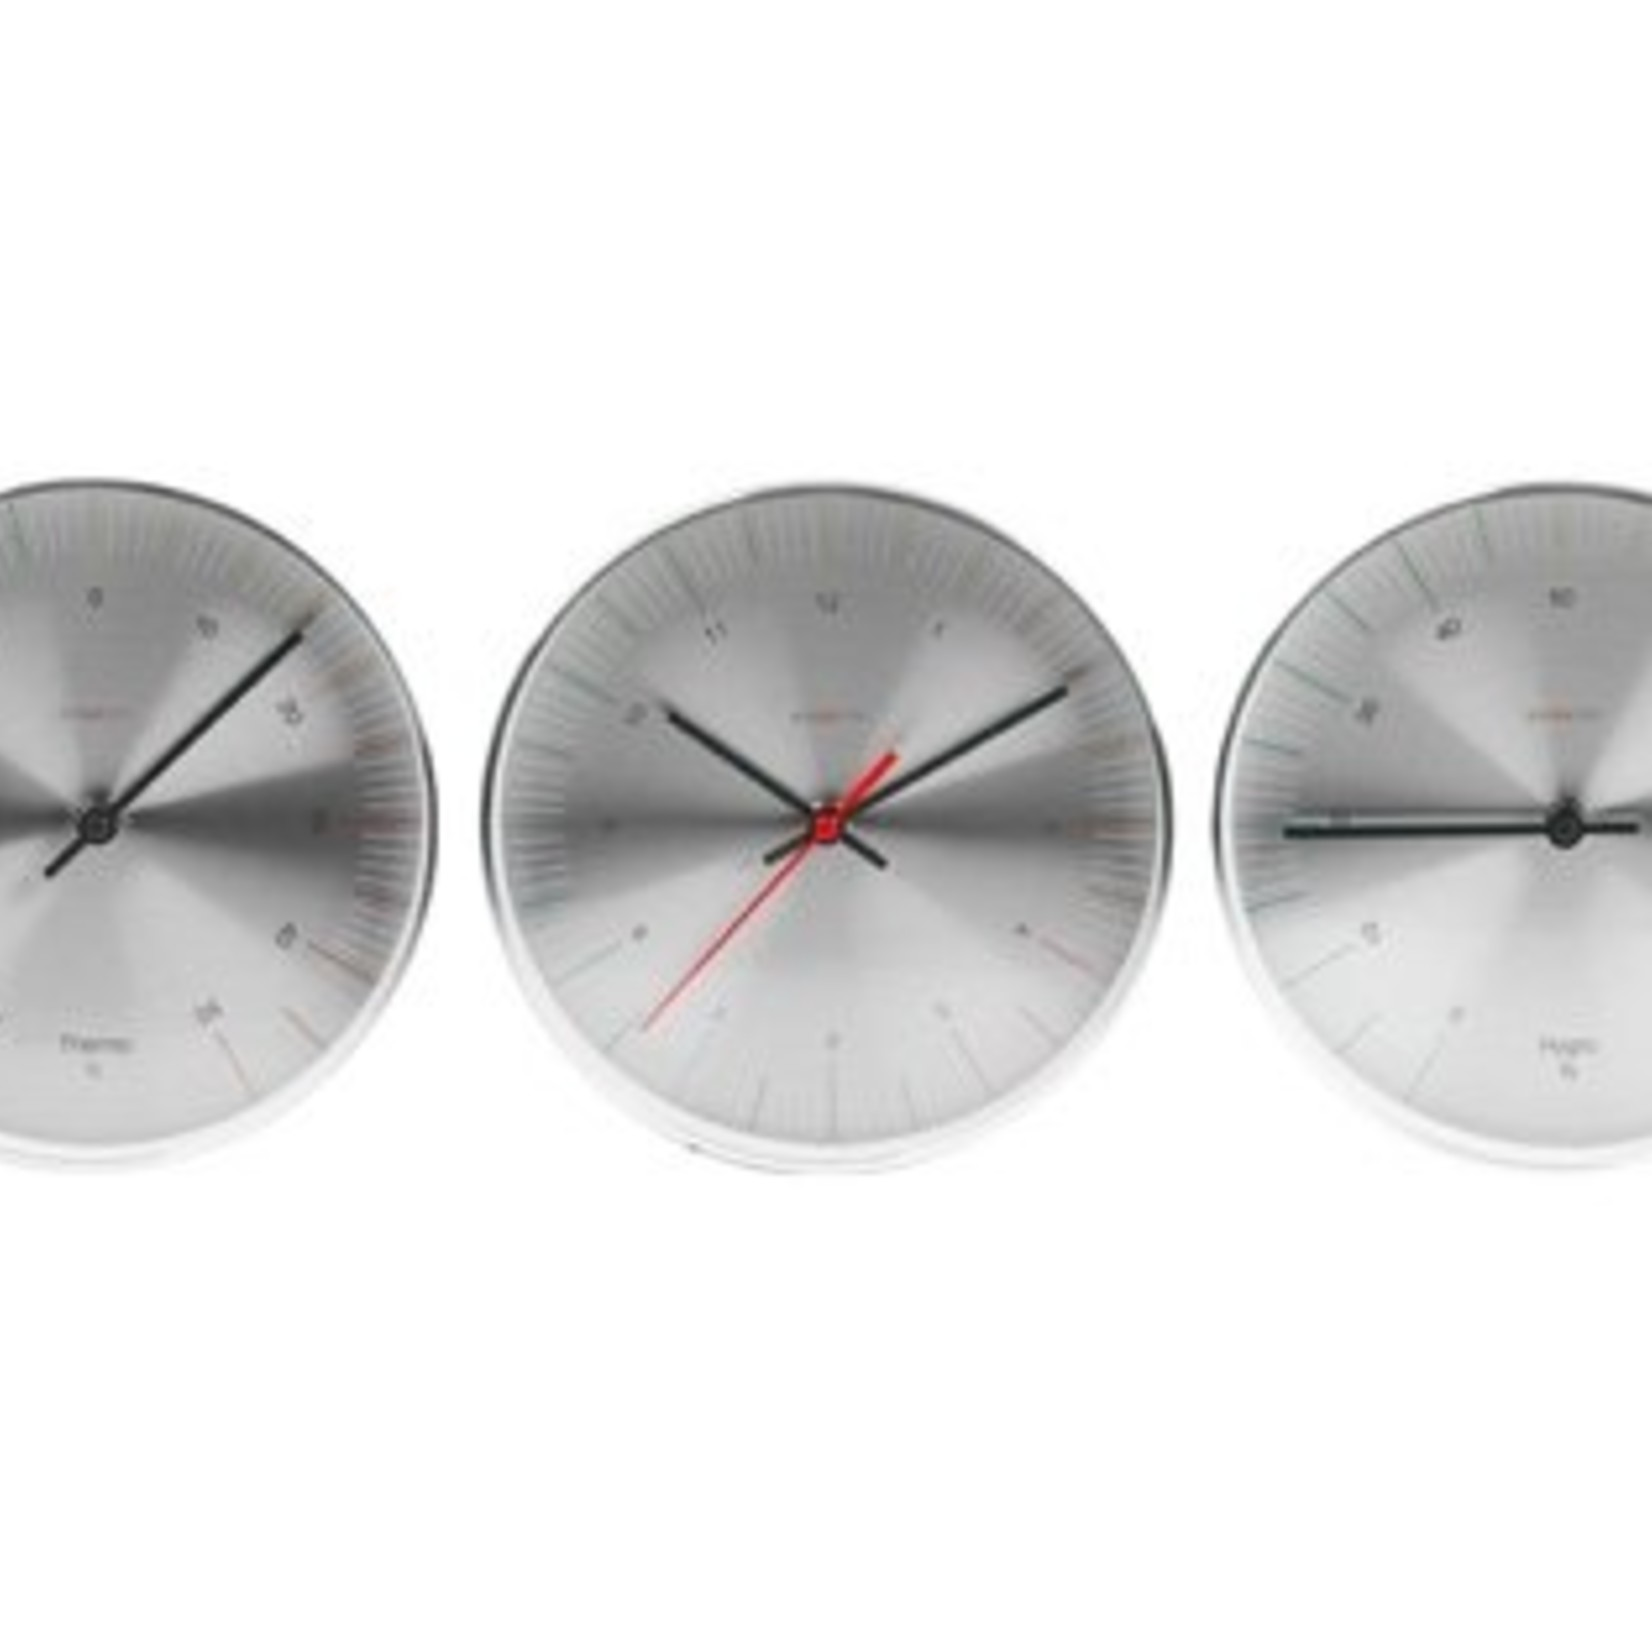 Karlsson Mooi design weerstation bestaand uit een klok, thermo en hygrometer